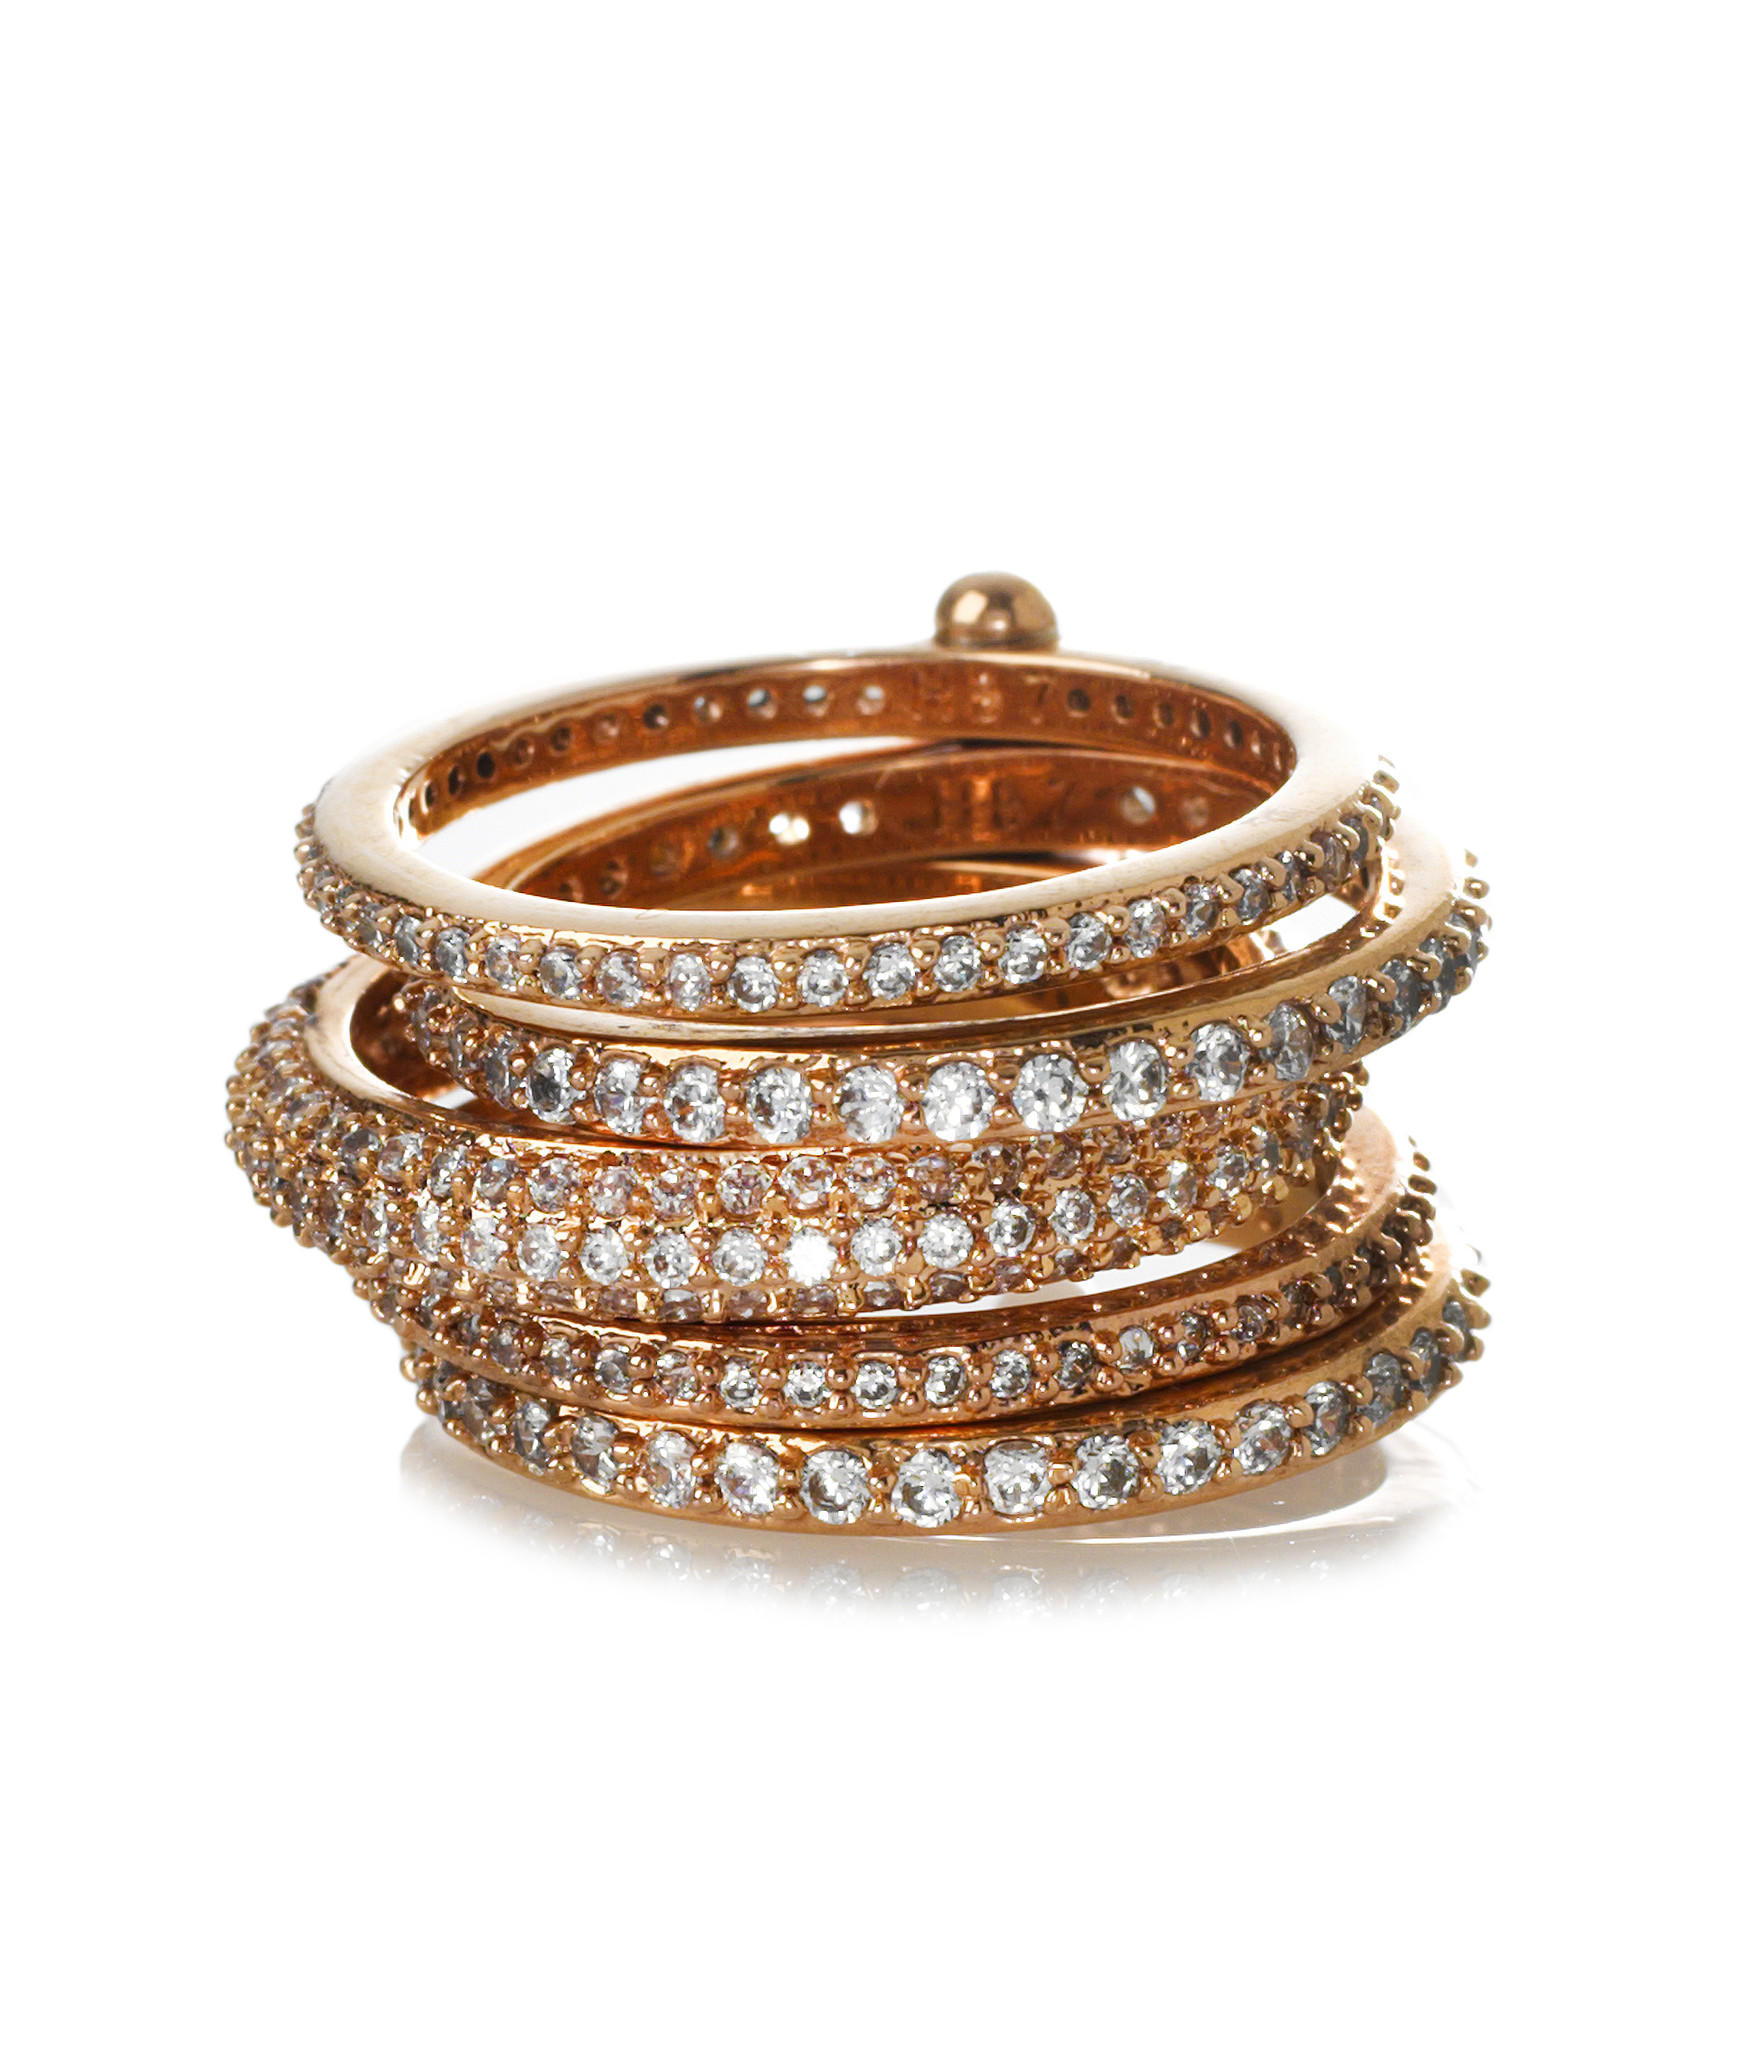 Henri Bendel Luxe Jewelry Line Debuts Latimes